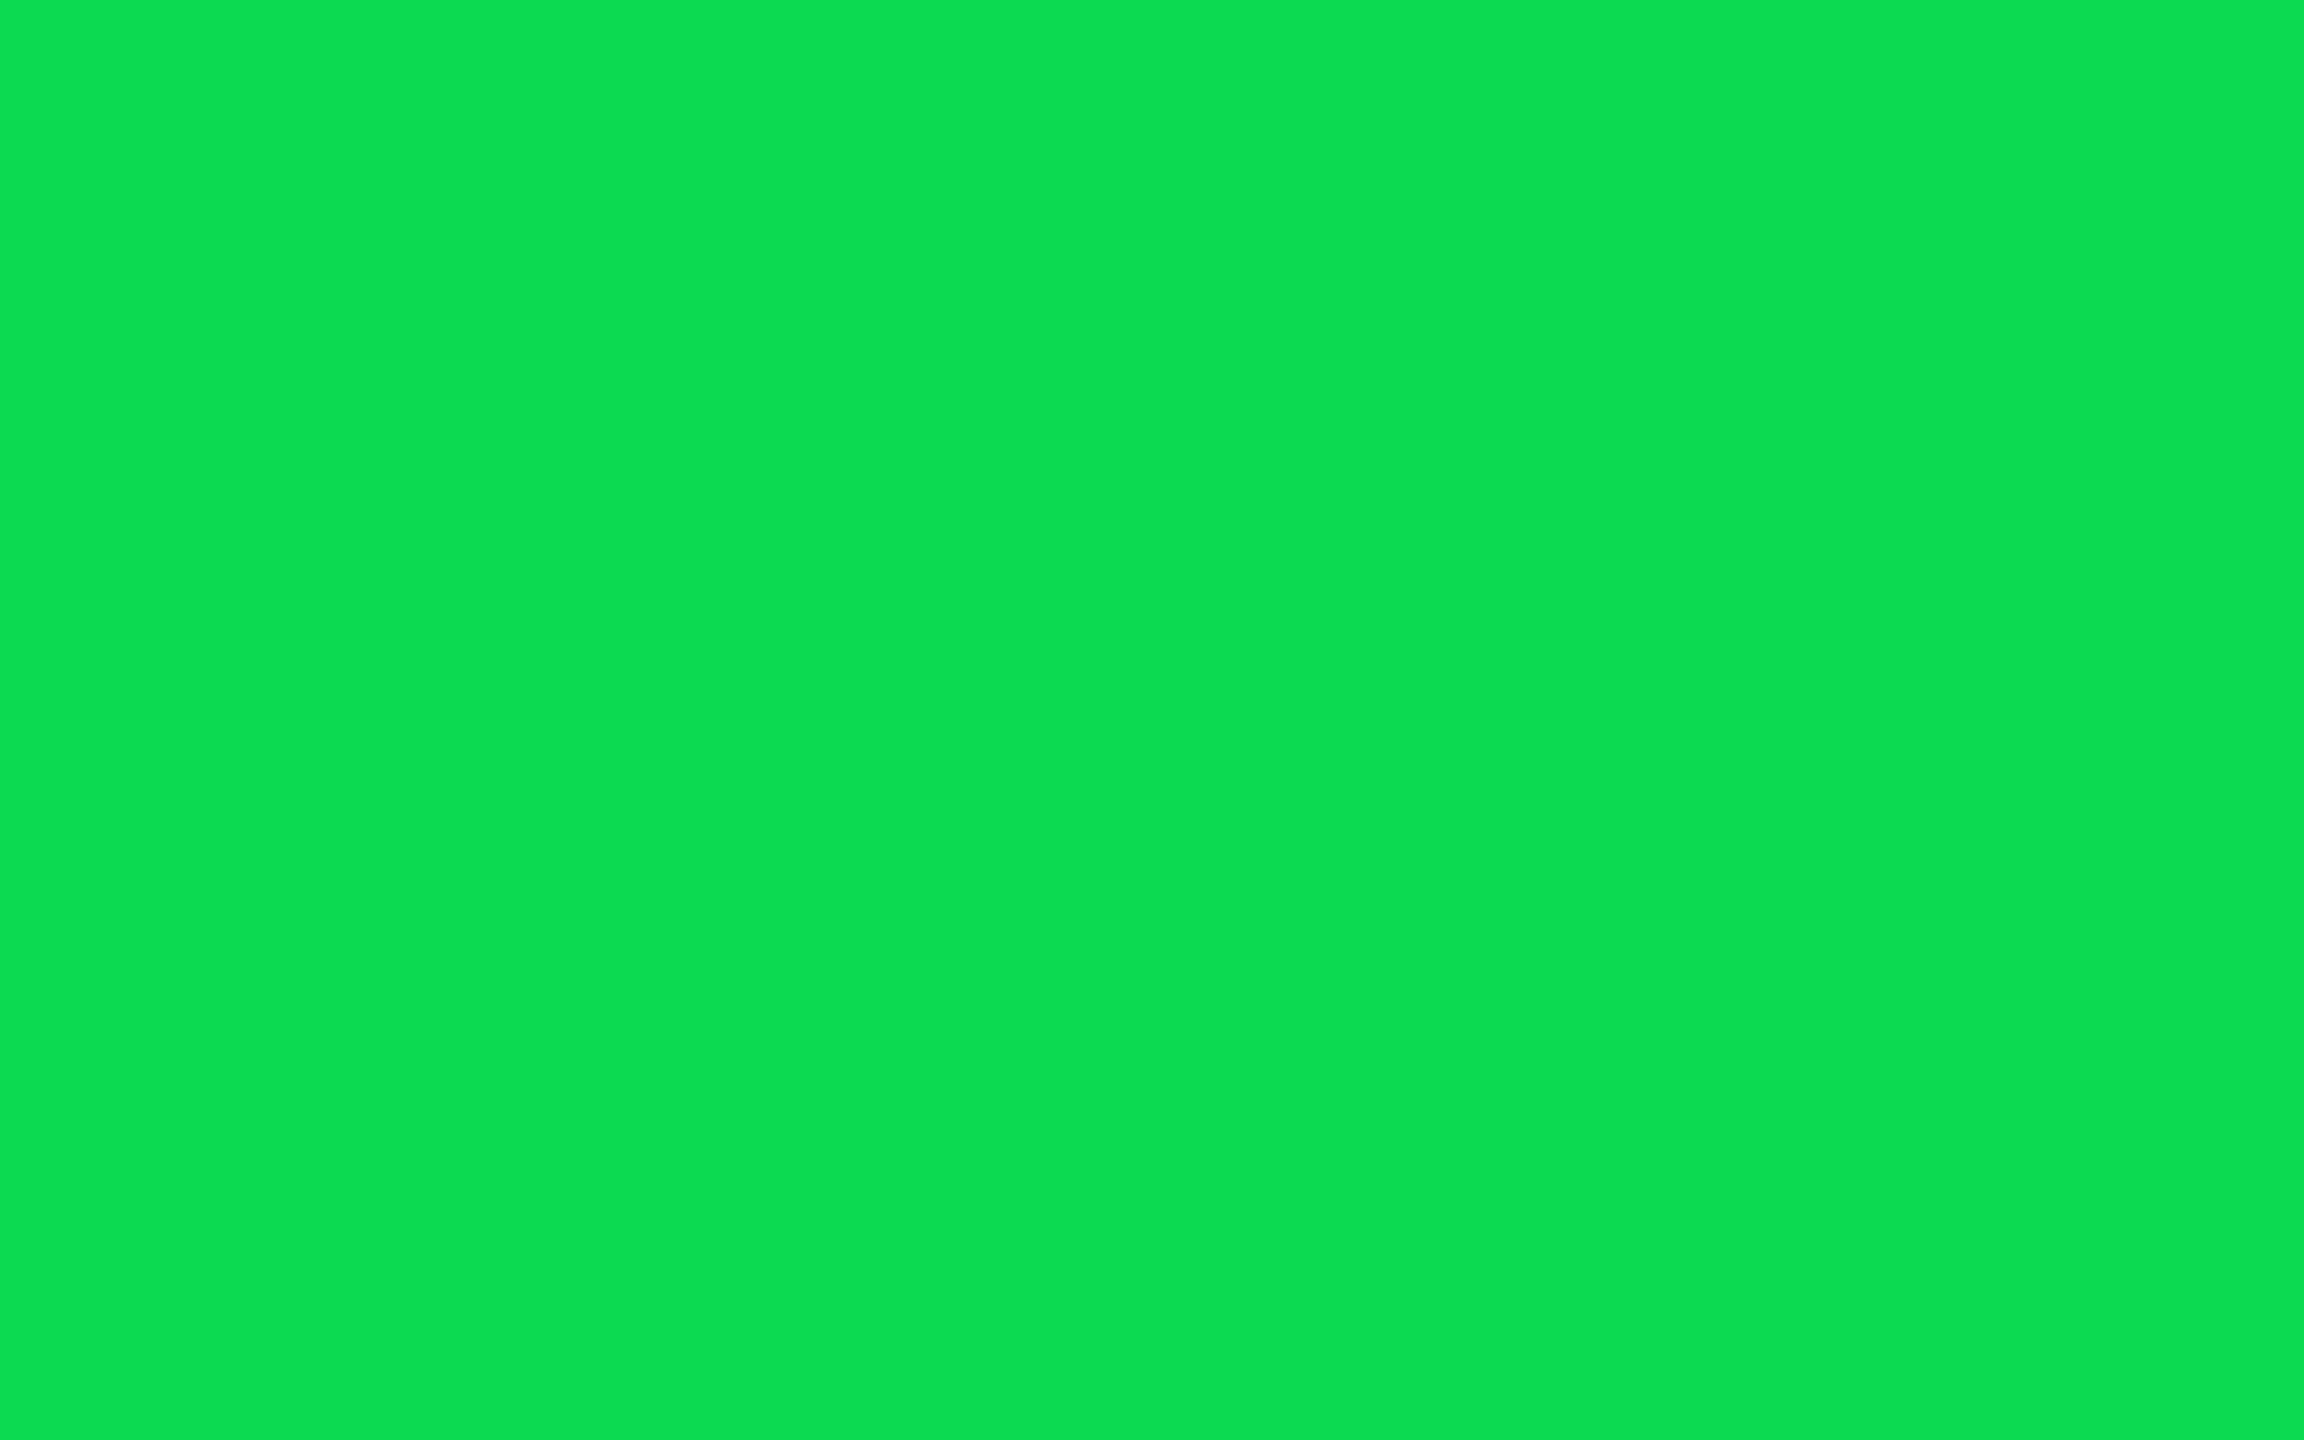 2304x1440 Malachite Solid Color Background